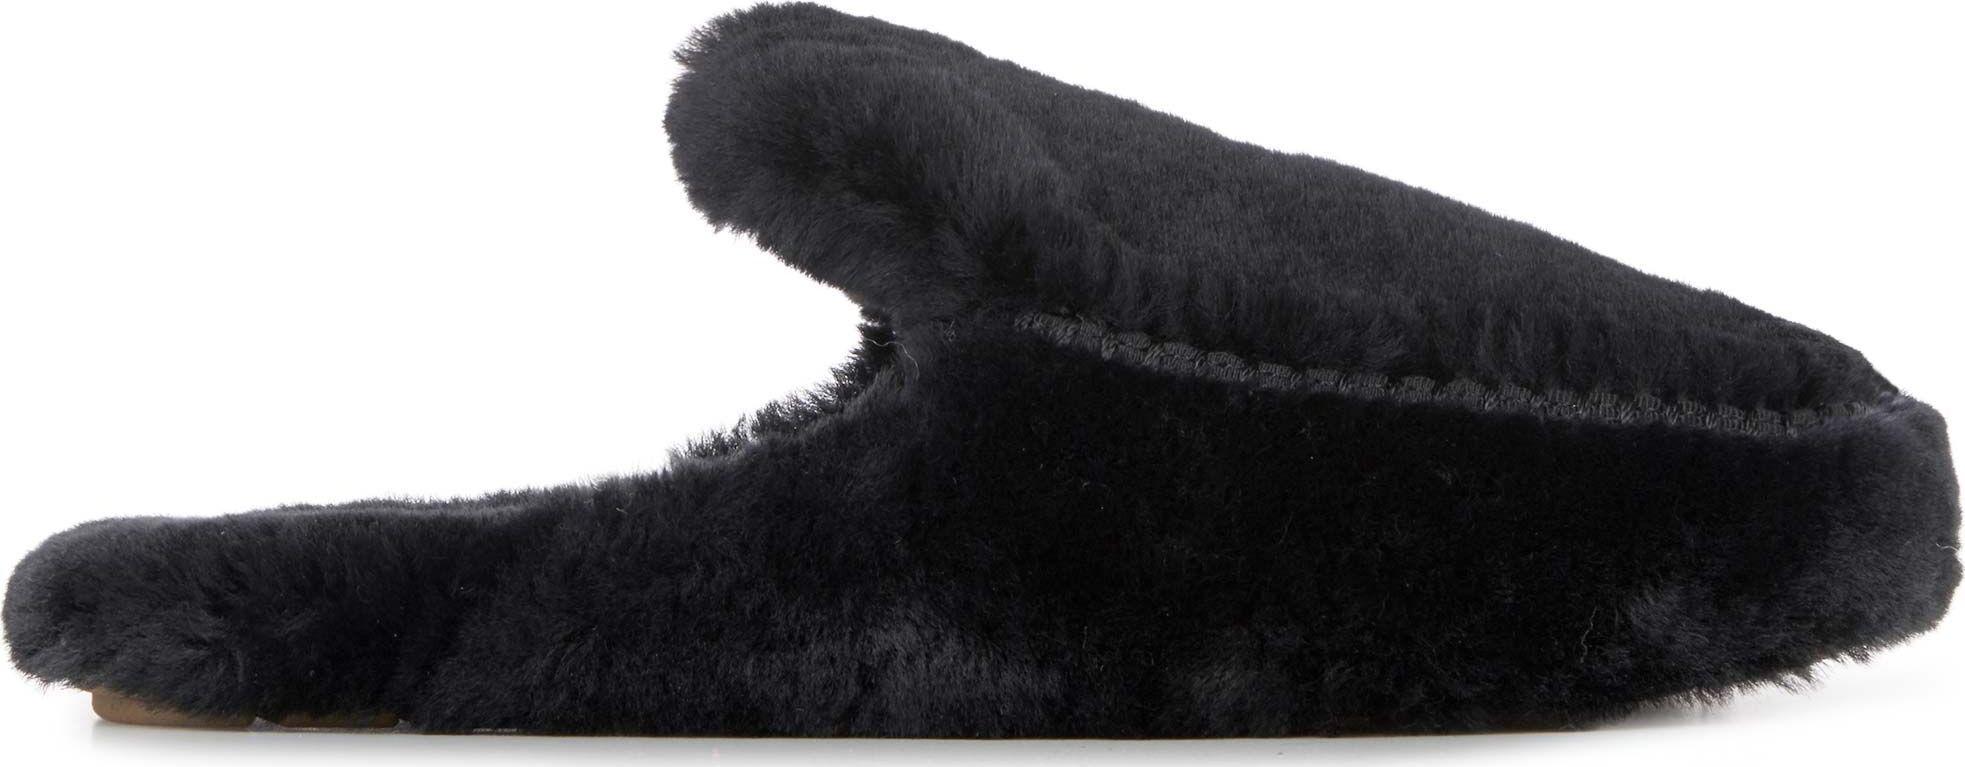 EMU Australia Faraday Black 37